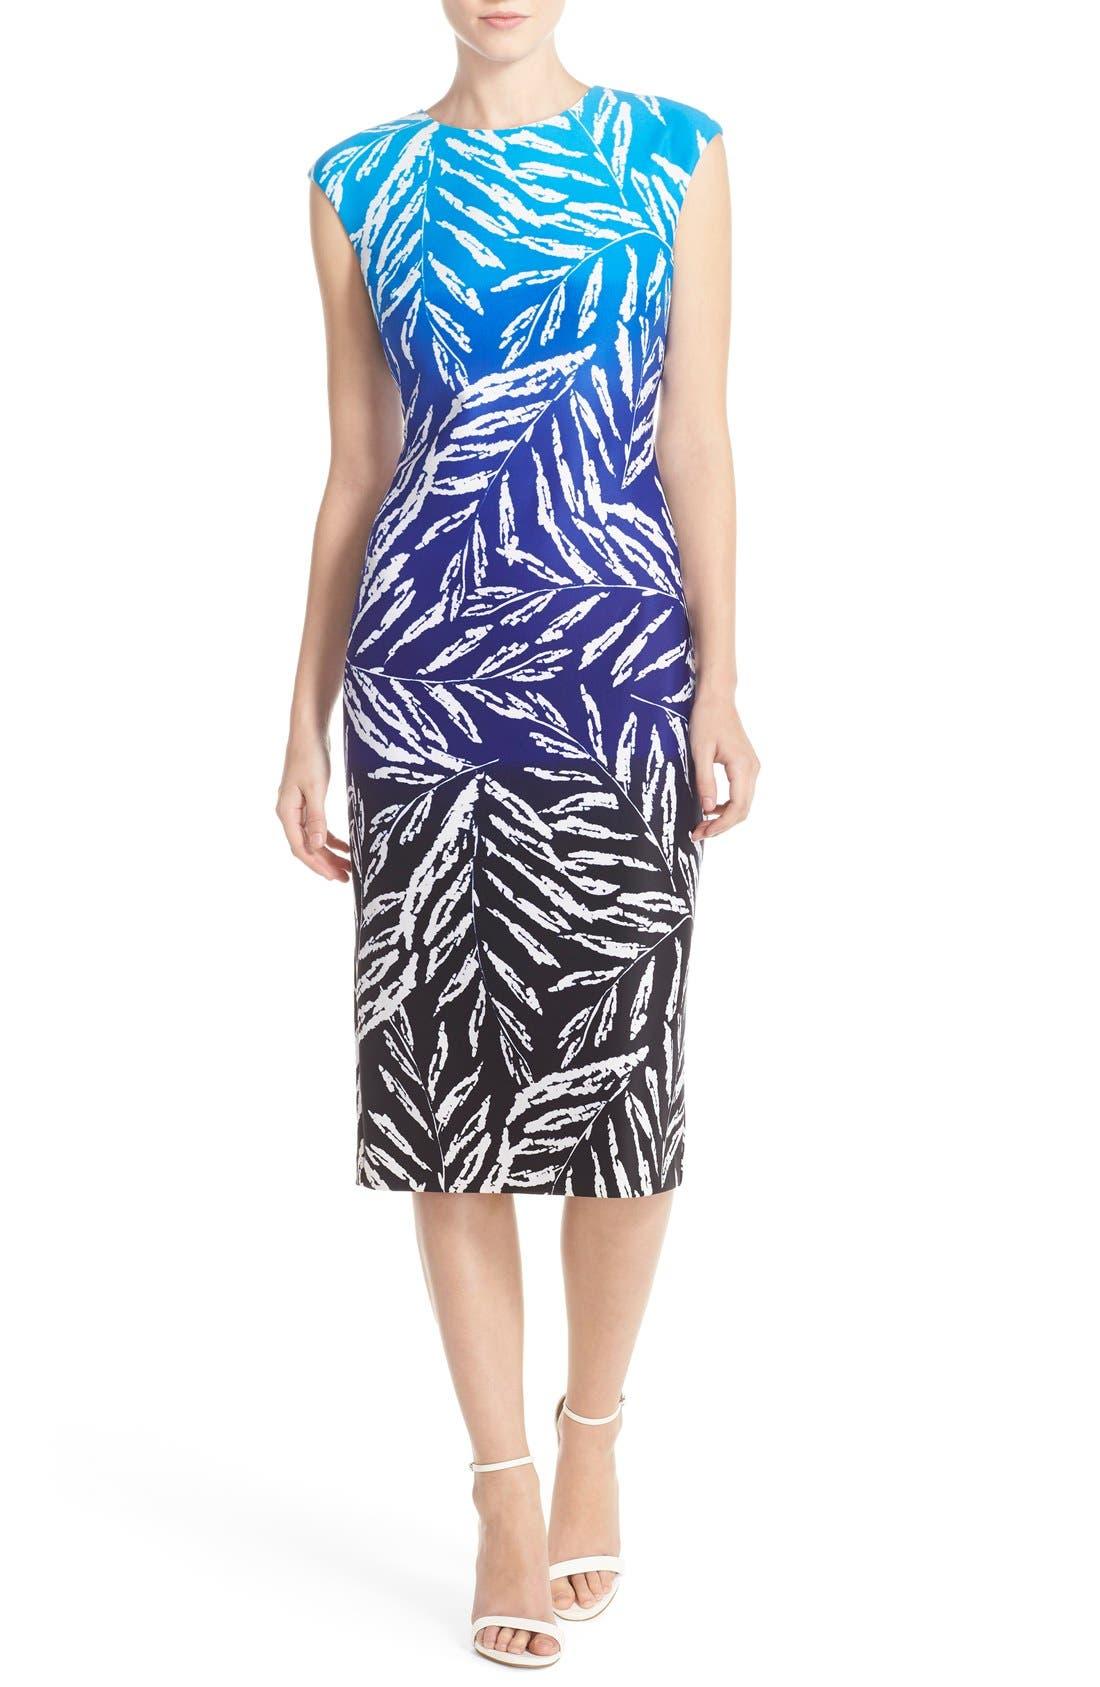 Main Image - Vince Camuto Ombré Print Stretch Scuba Midi Dress